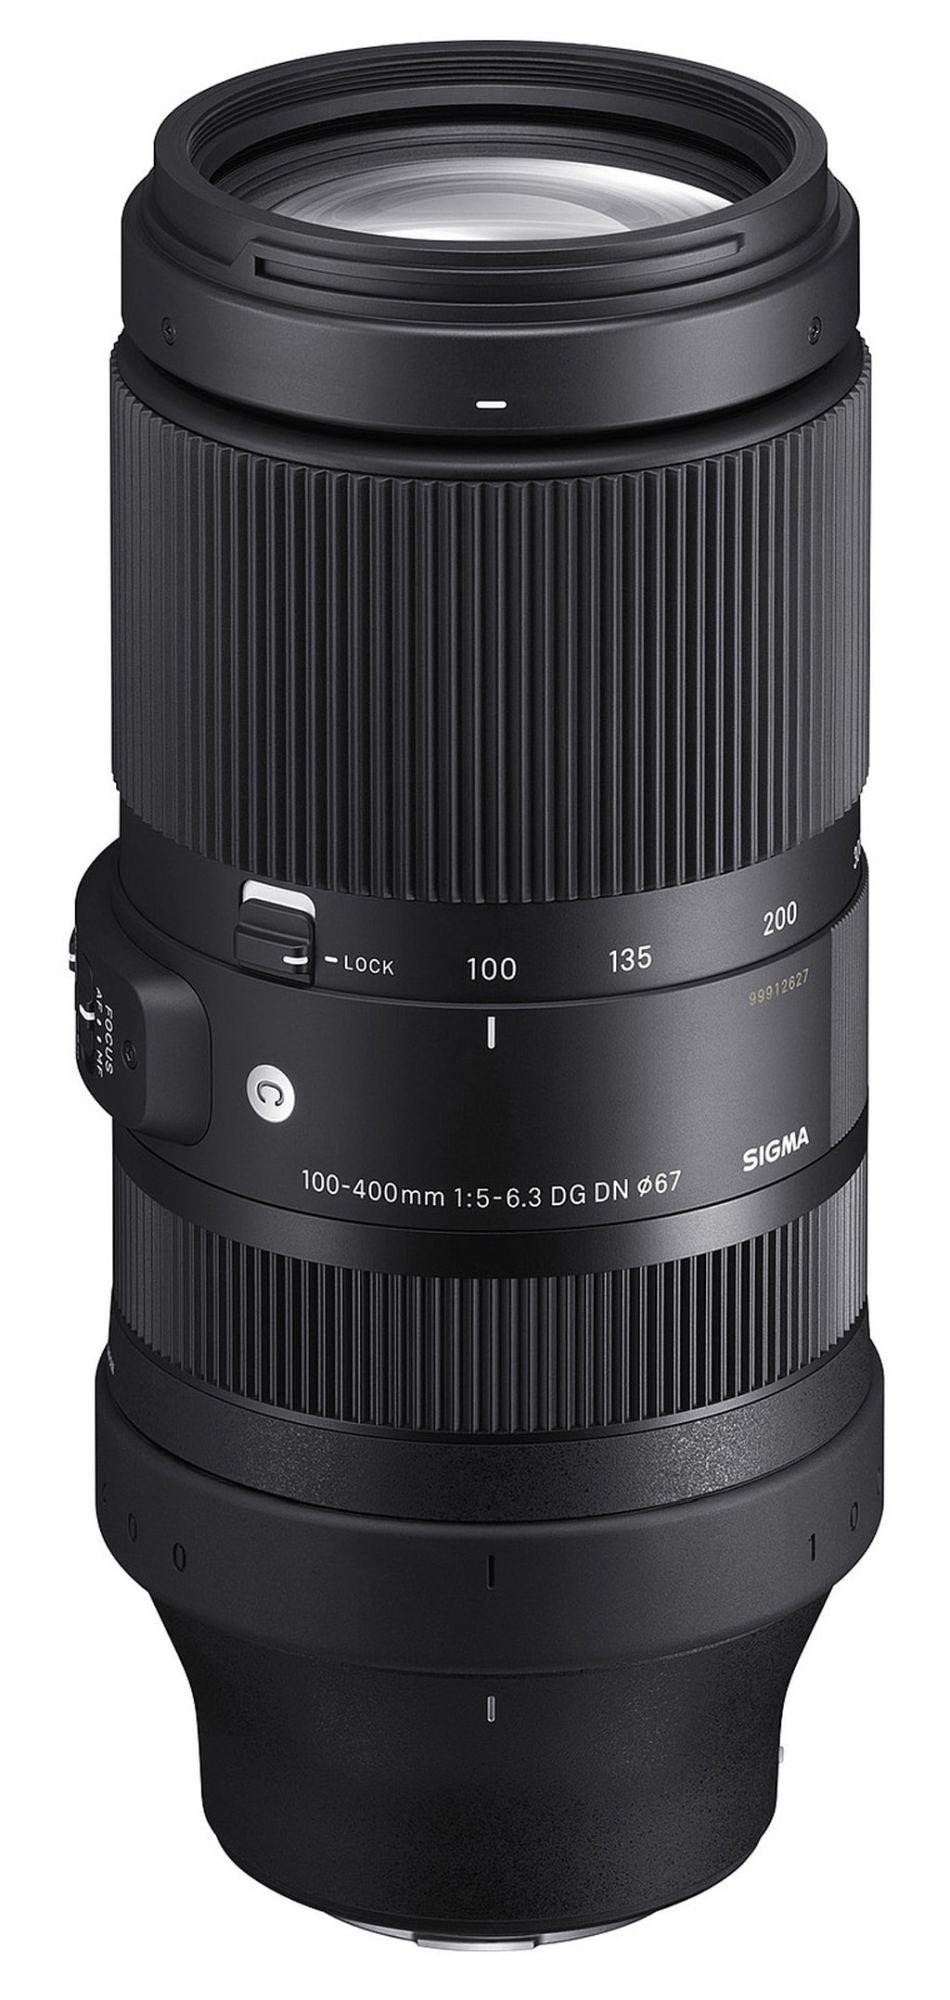 Sigma 100-400mm 1:5,0-6,3 DG DN OS Contemporary für Sony E-Mount inkl. TS-111 Stativschelle